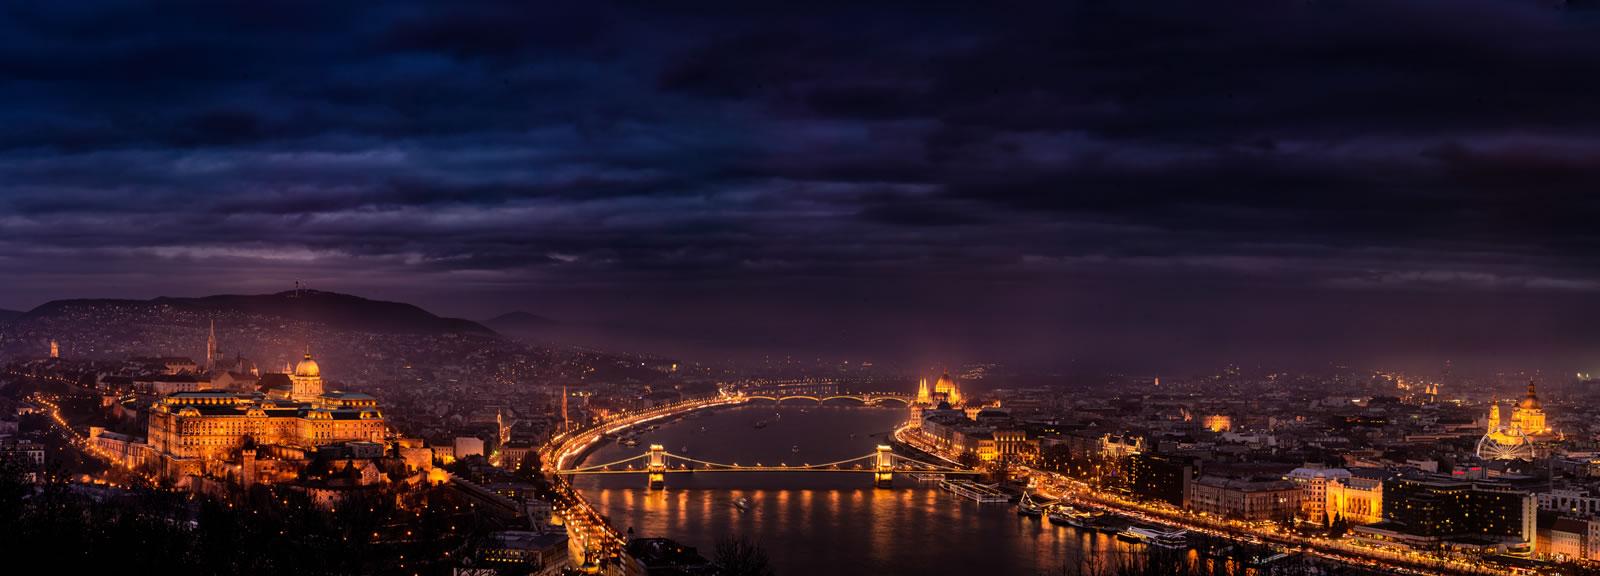 Budapesti látnivalók